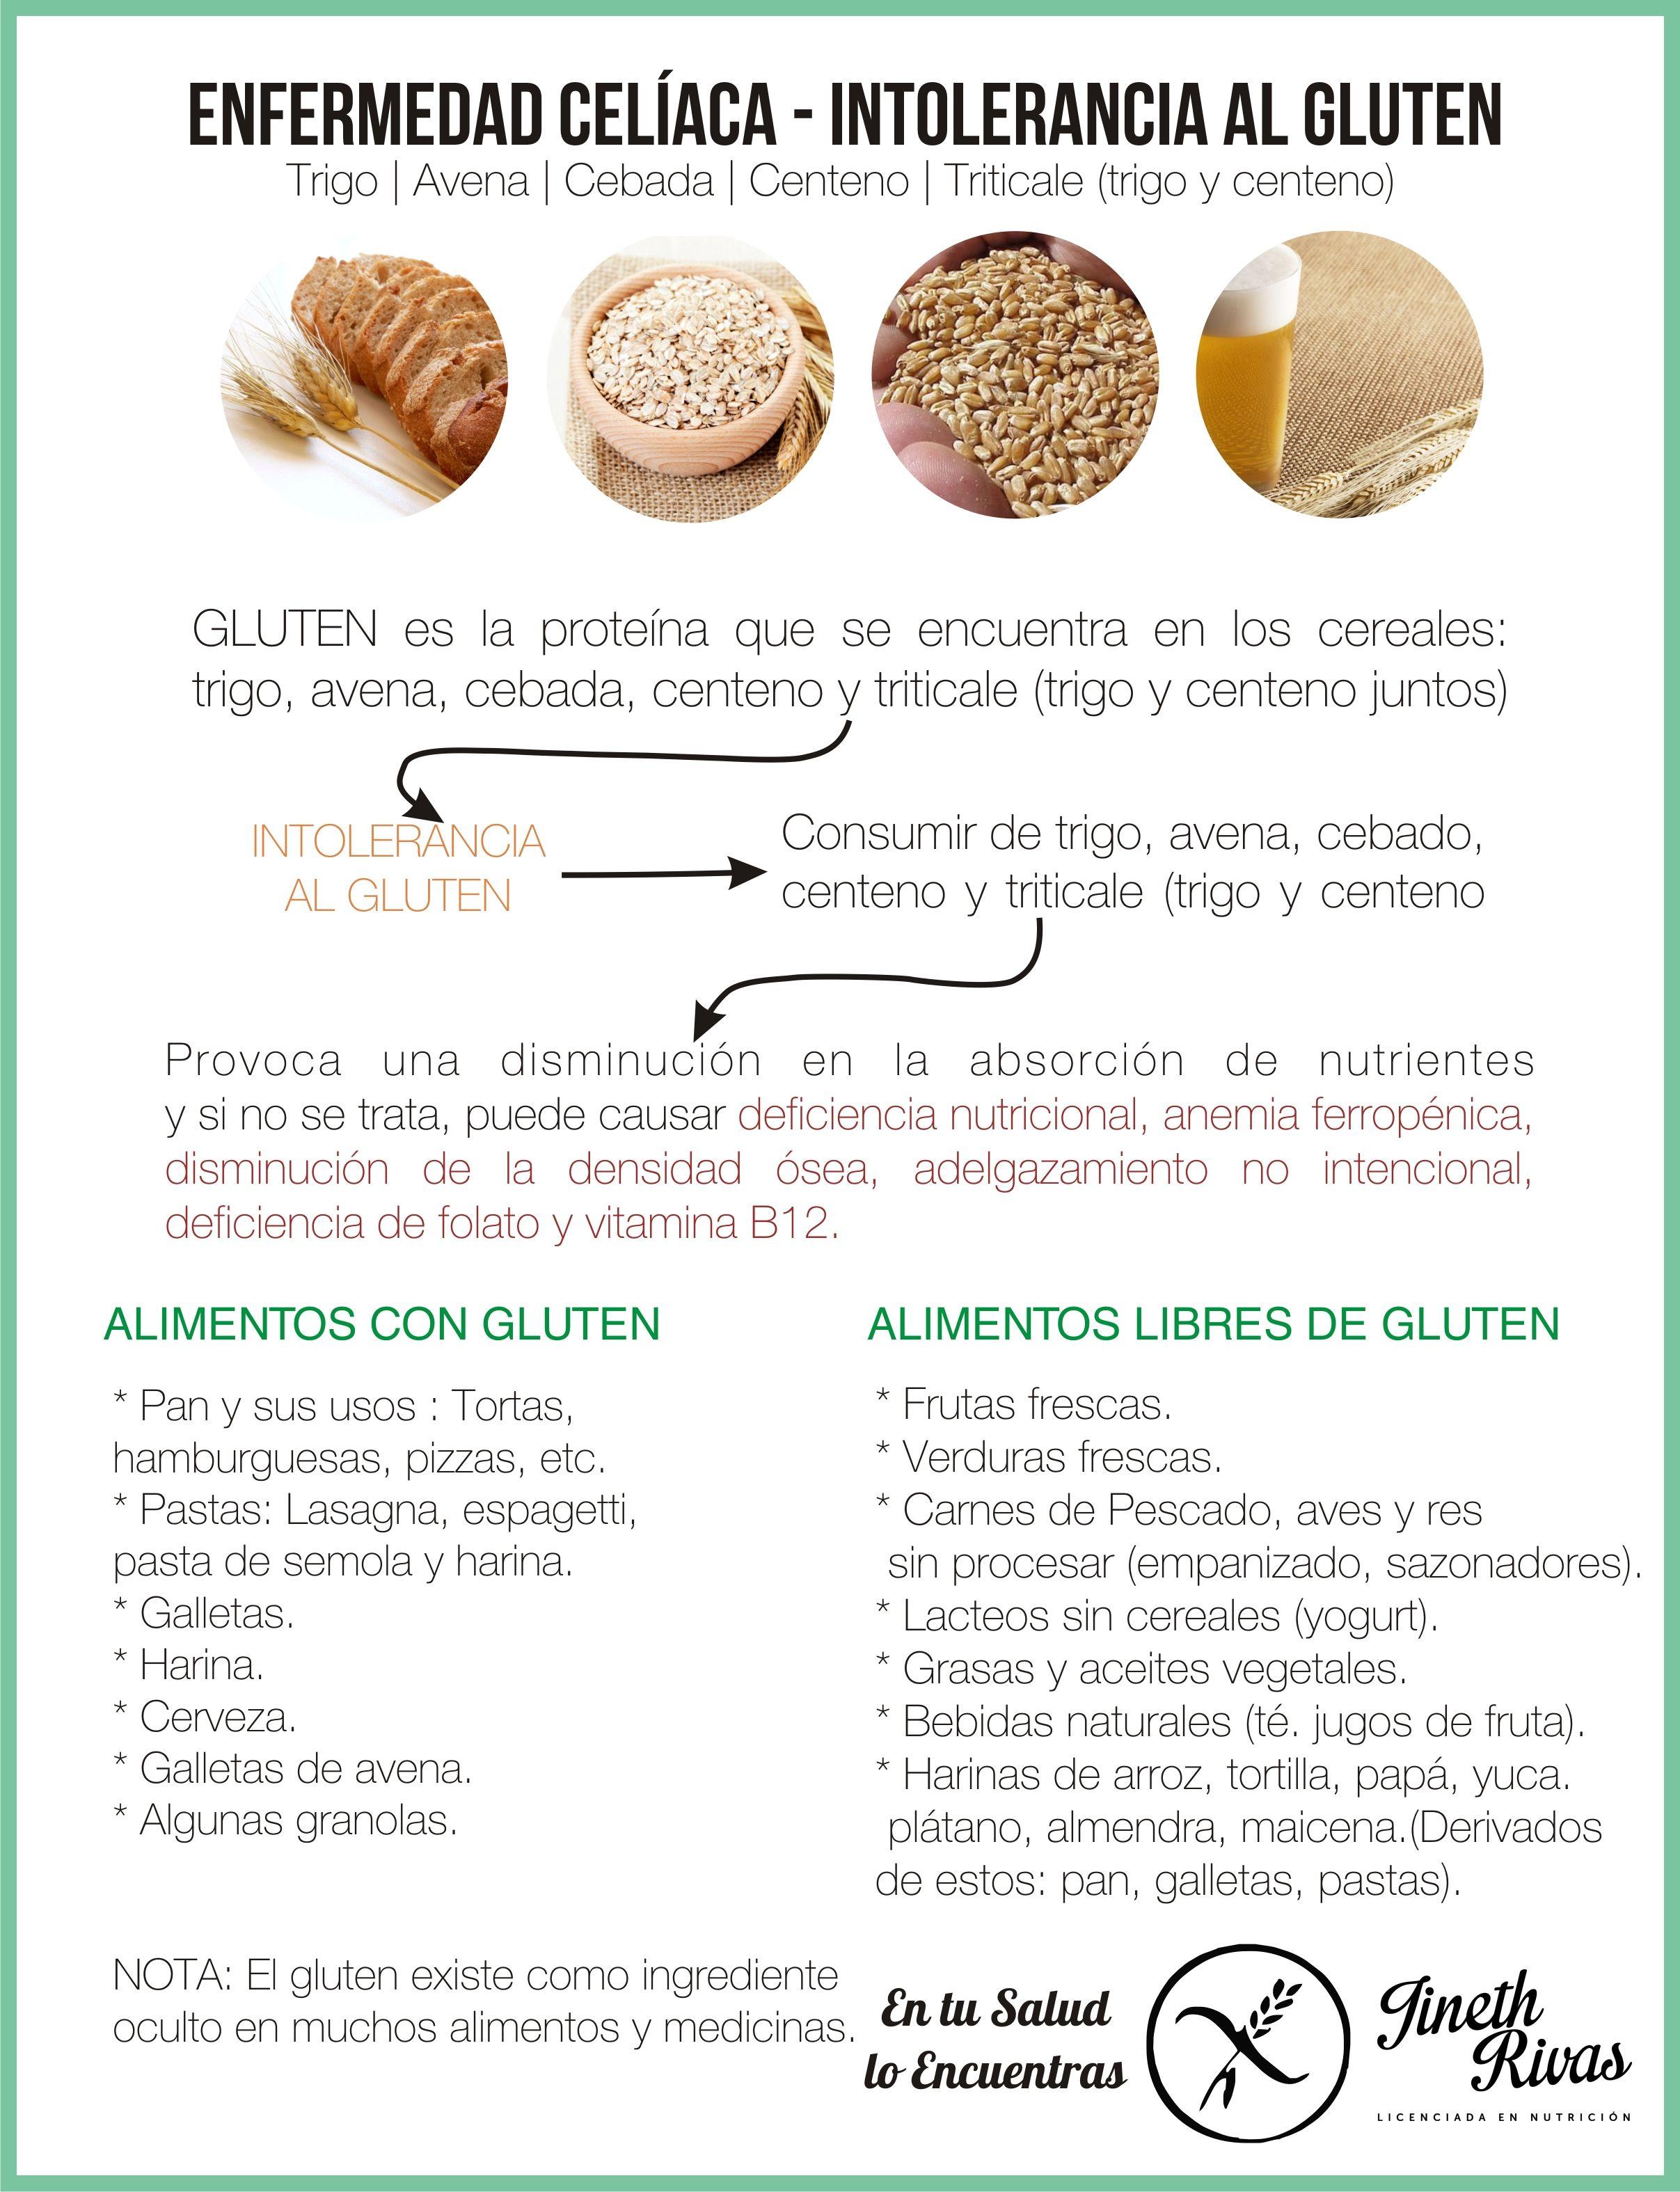 Dieta intolerancia al gluten